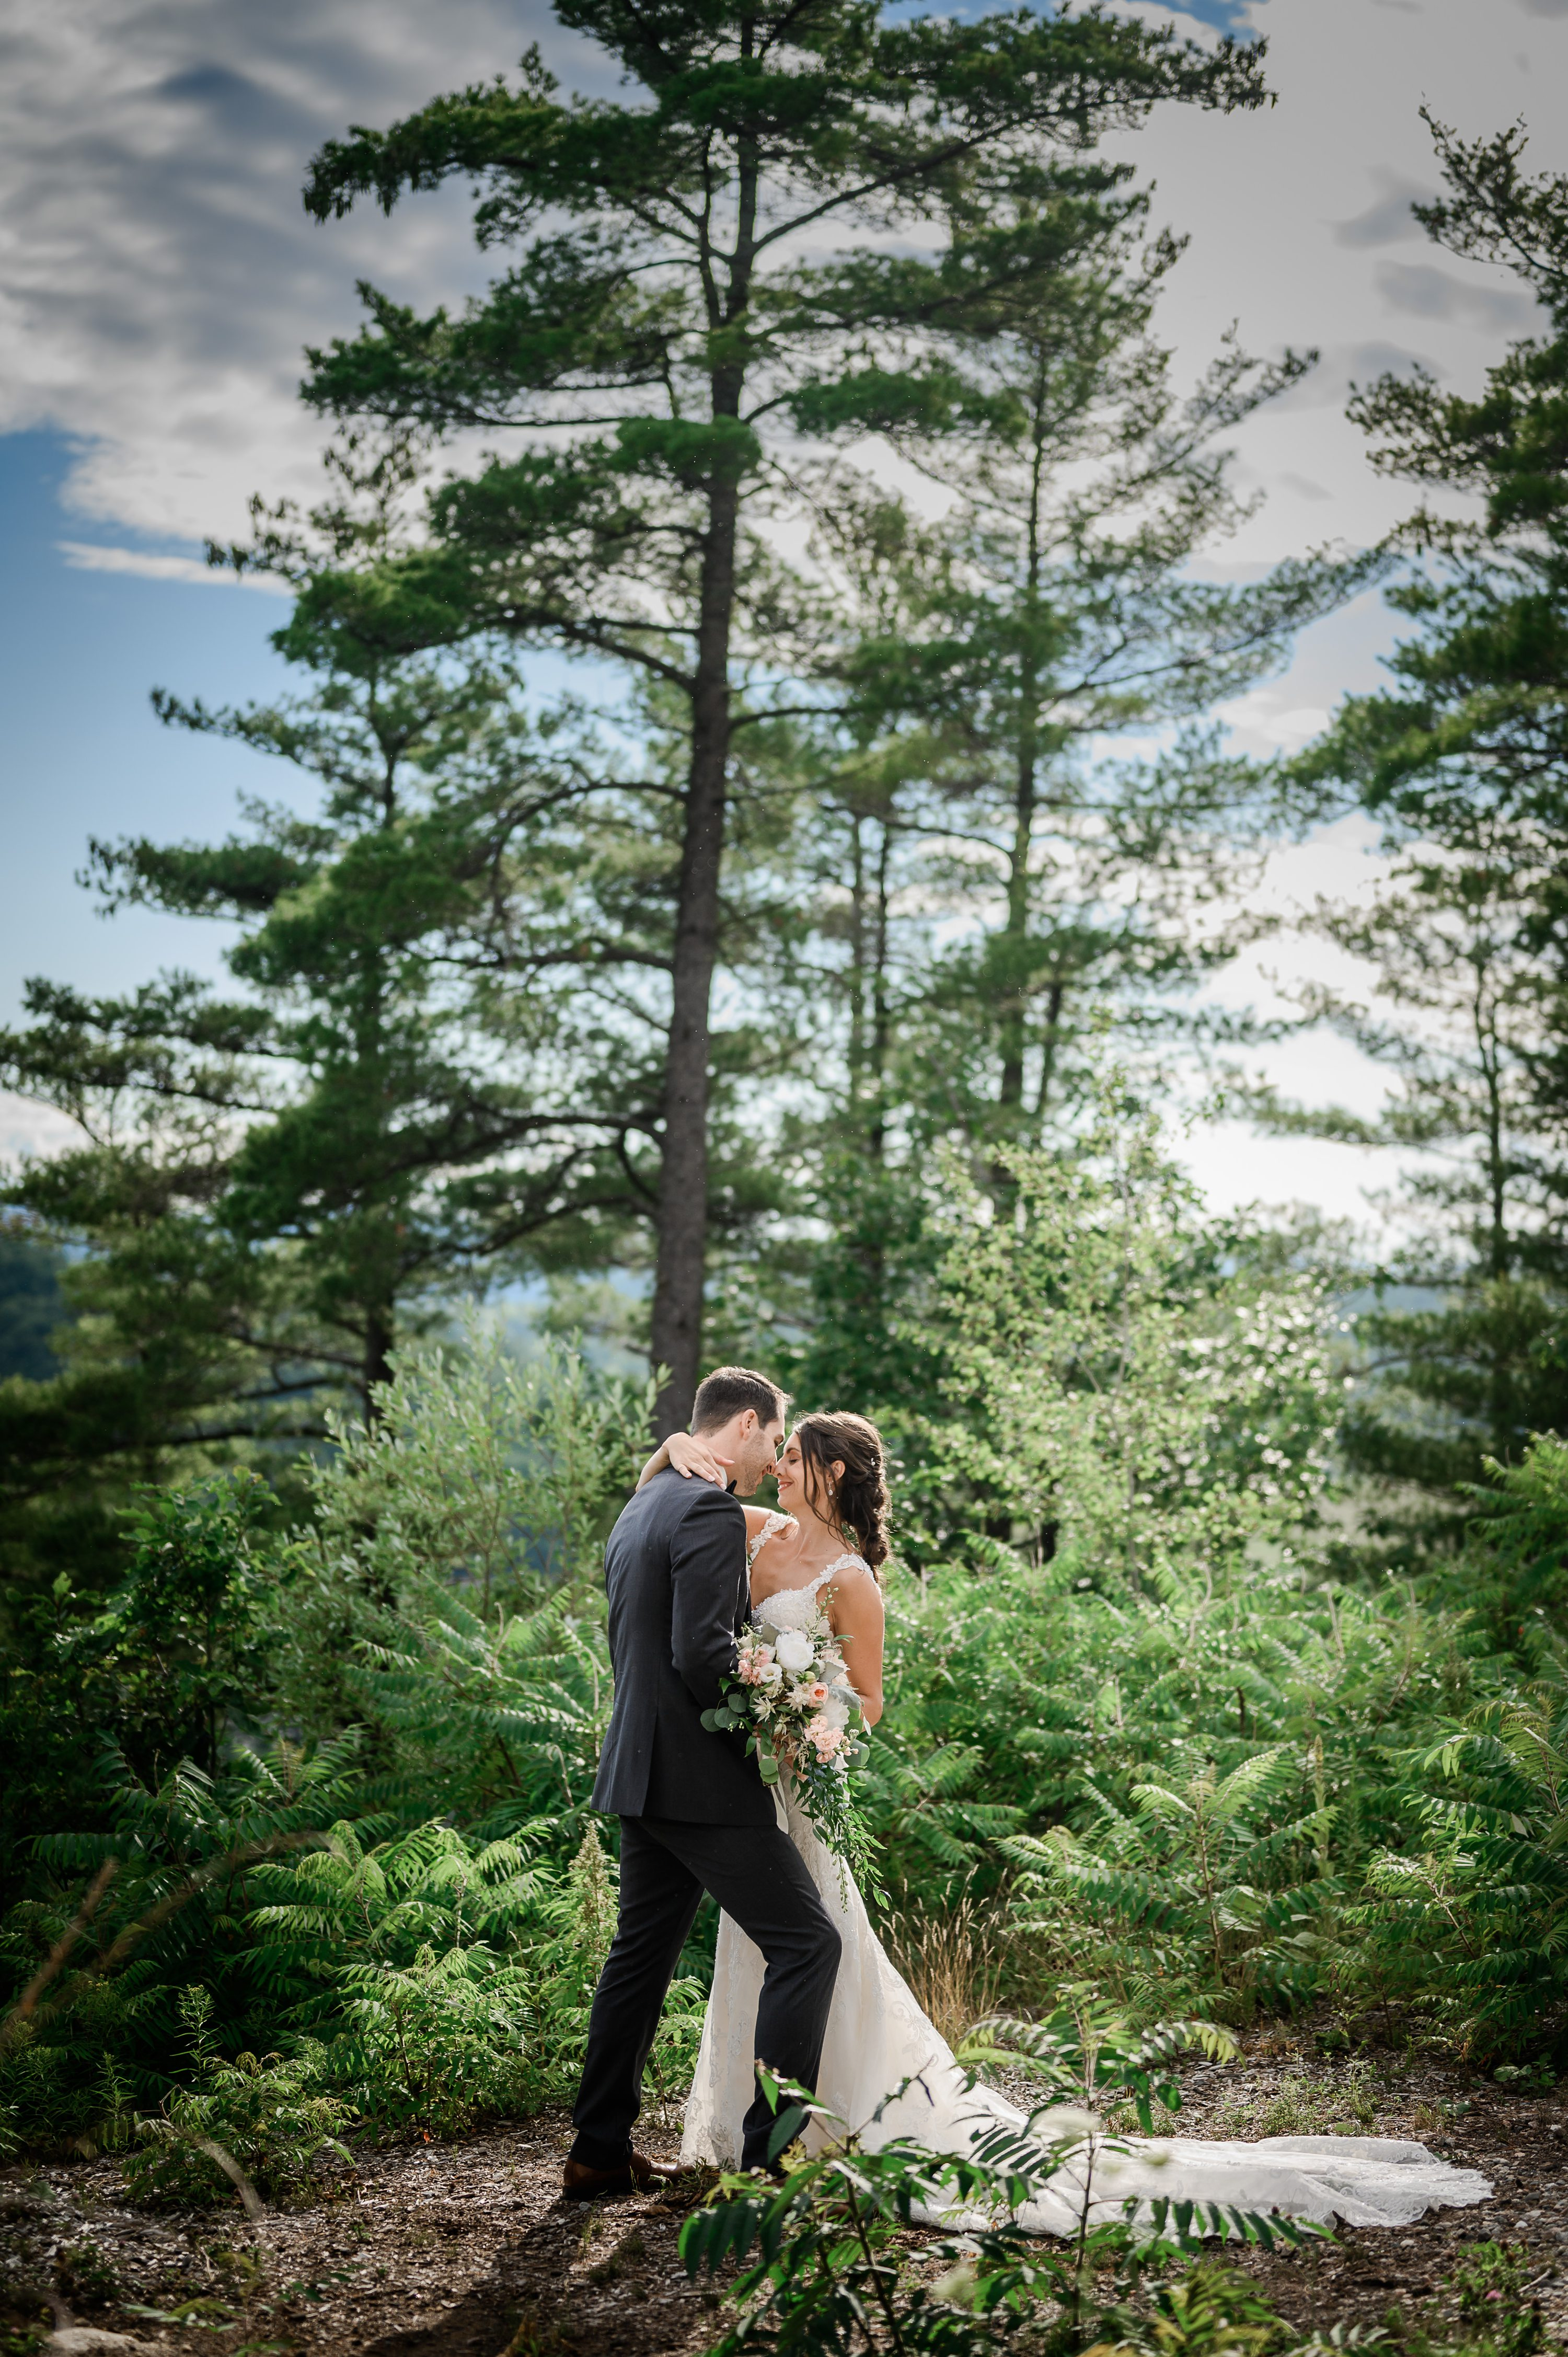 genevieve albert photographe,wedding photographer